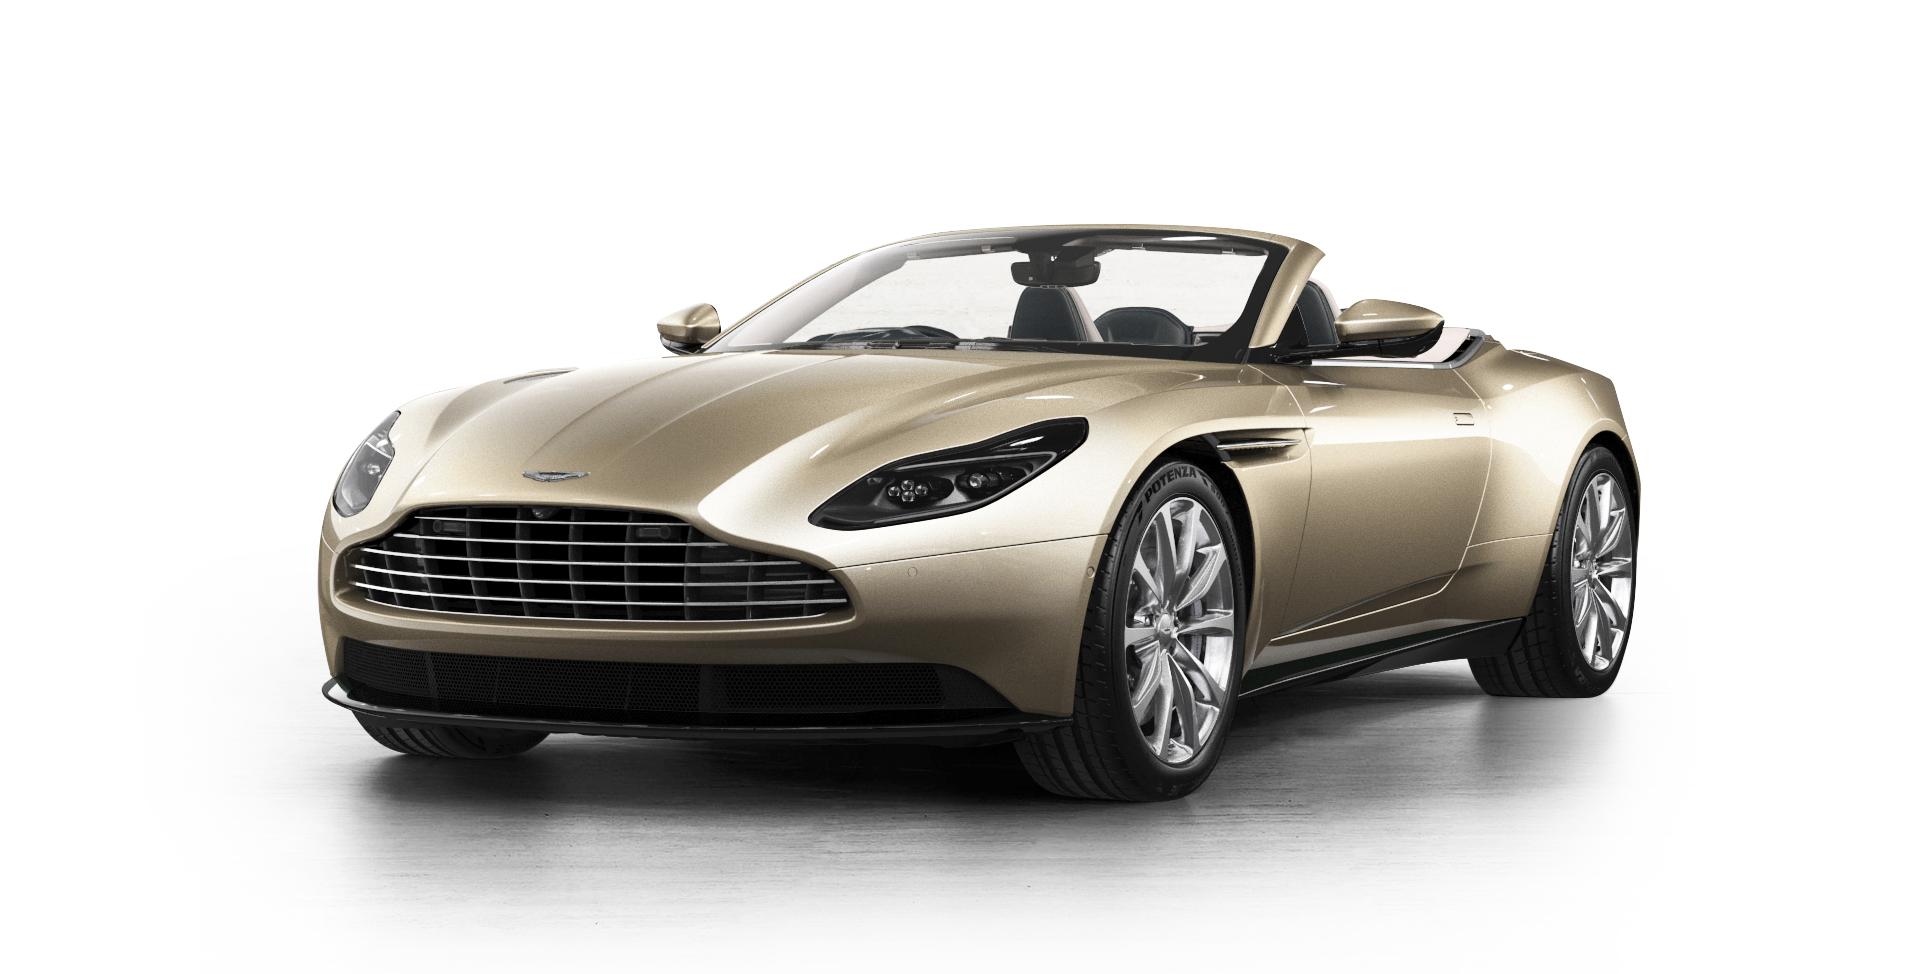 Used Aston Martins For Sale In Miami The Collection - Aston martin dealer miami